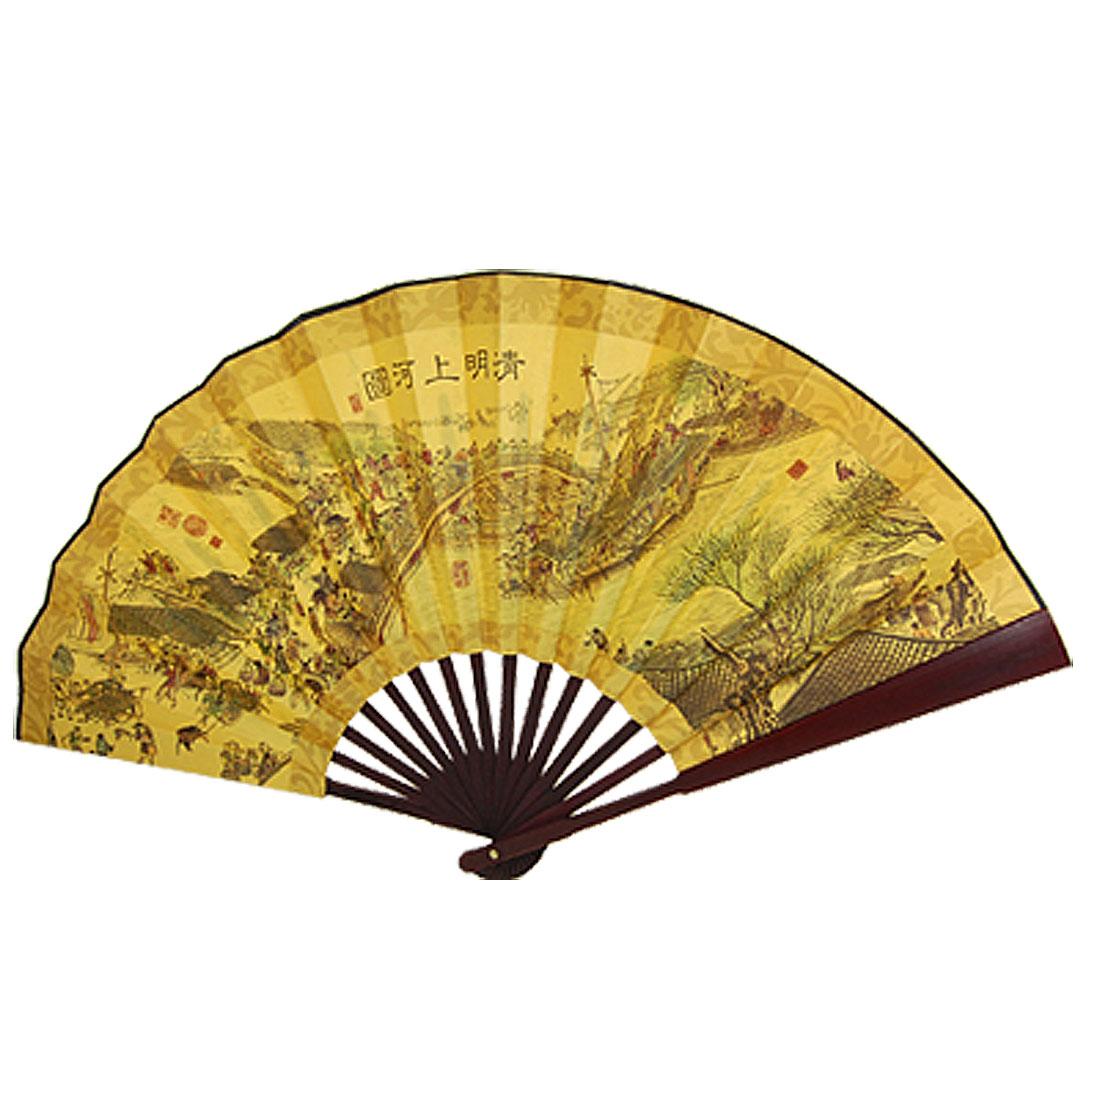 Qing Ming Shang He Tu Print Yellow Paper Large Chinese Handheld Bamboo Fan